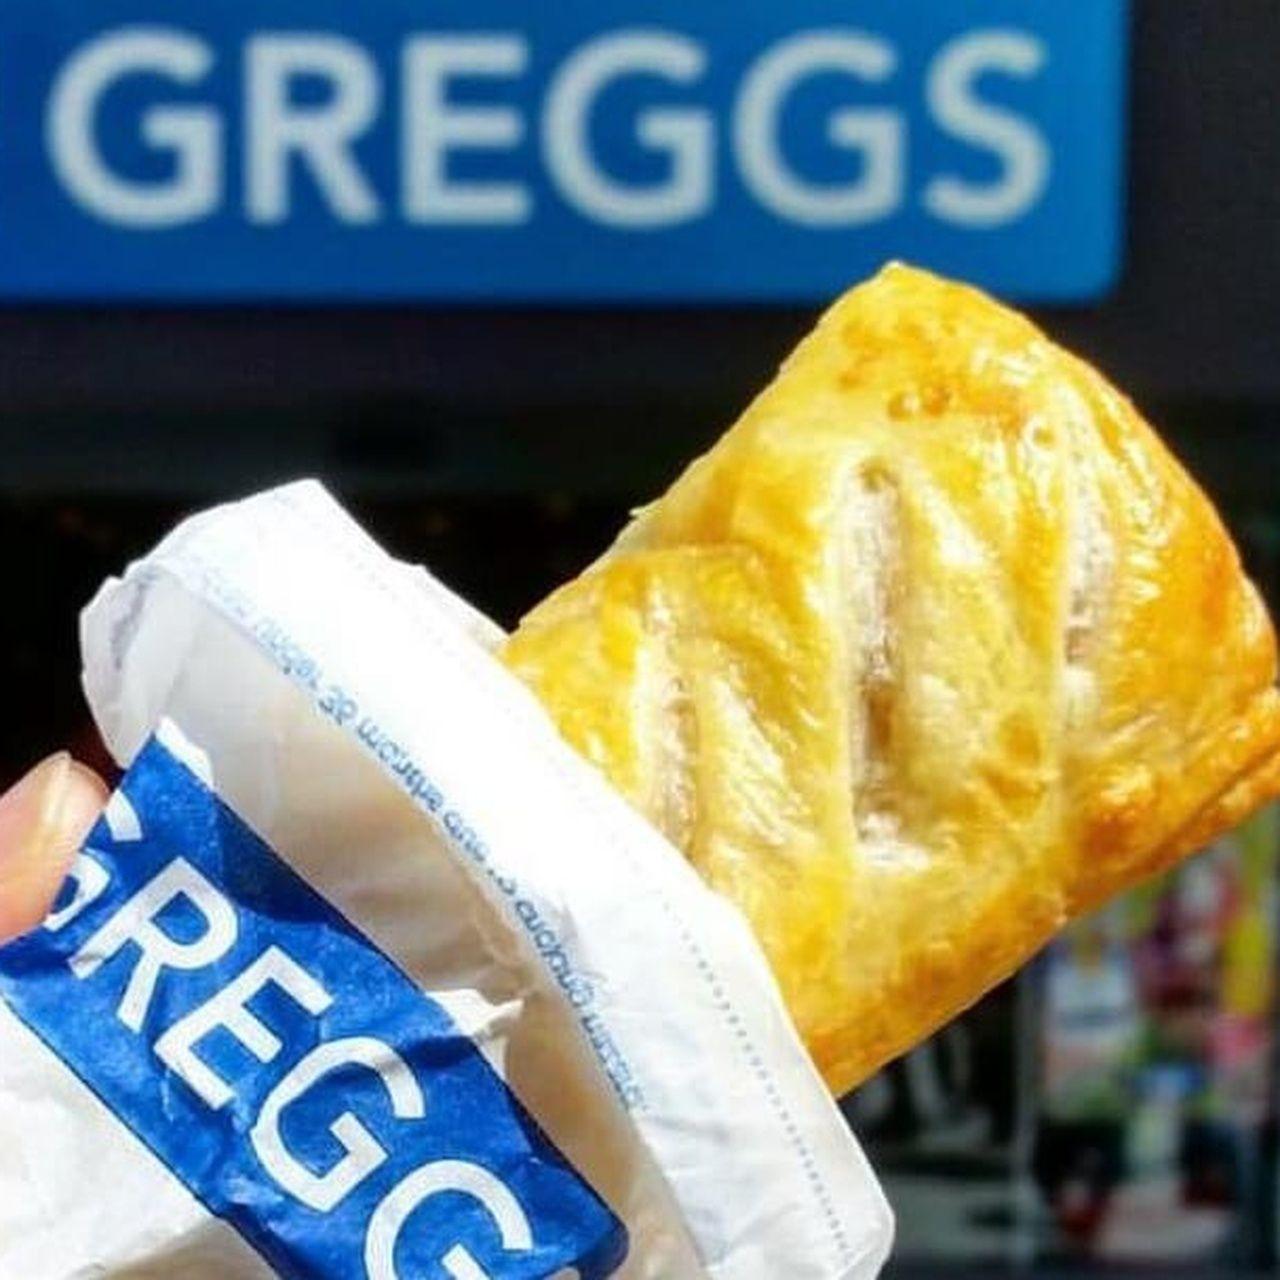 Vegan Sausage Rolls Help Greggs Top 1 Billion Sales Vegan Sausage Vegan Sausage Rolls Sausage Rolls